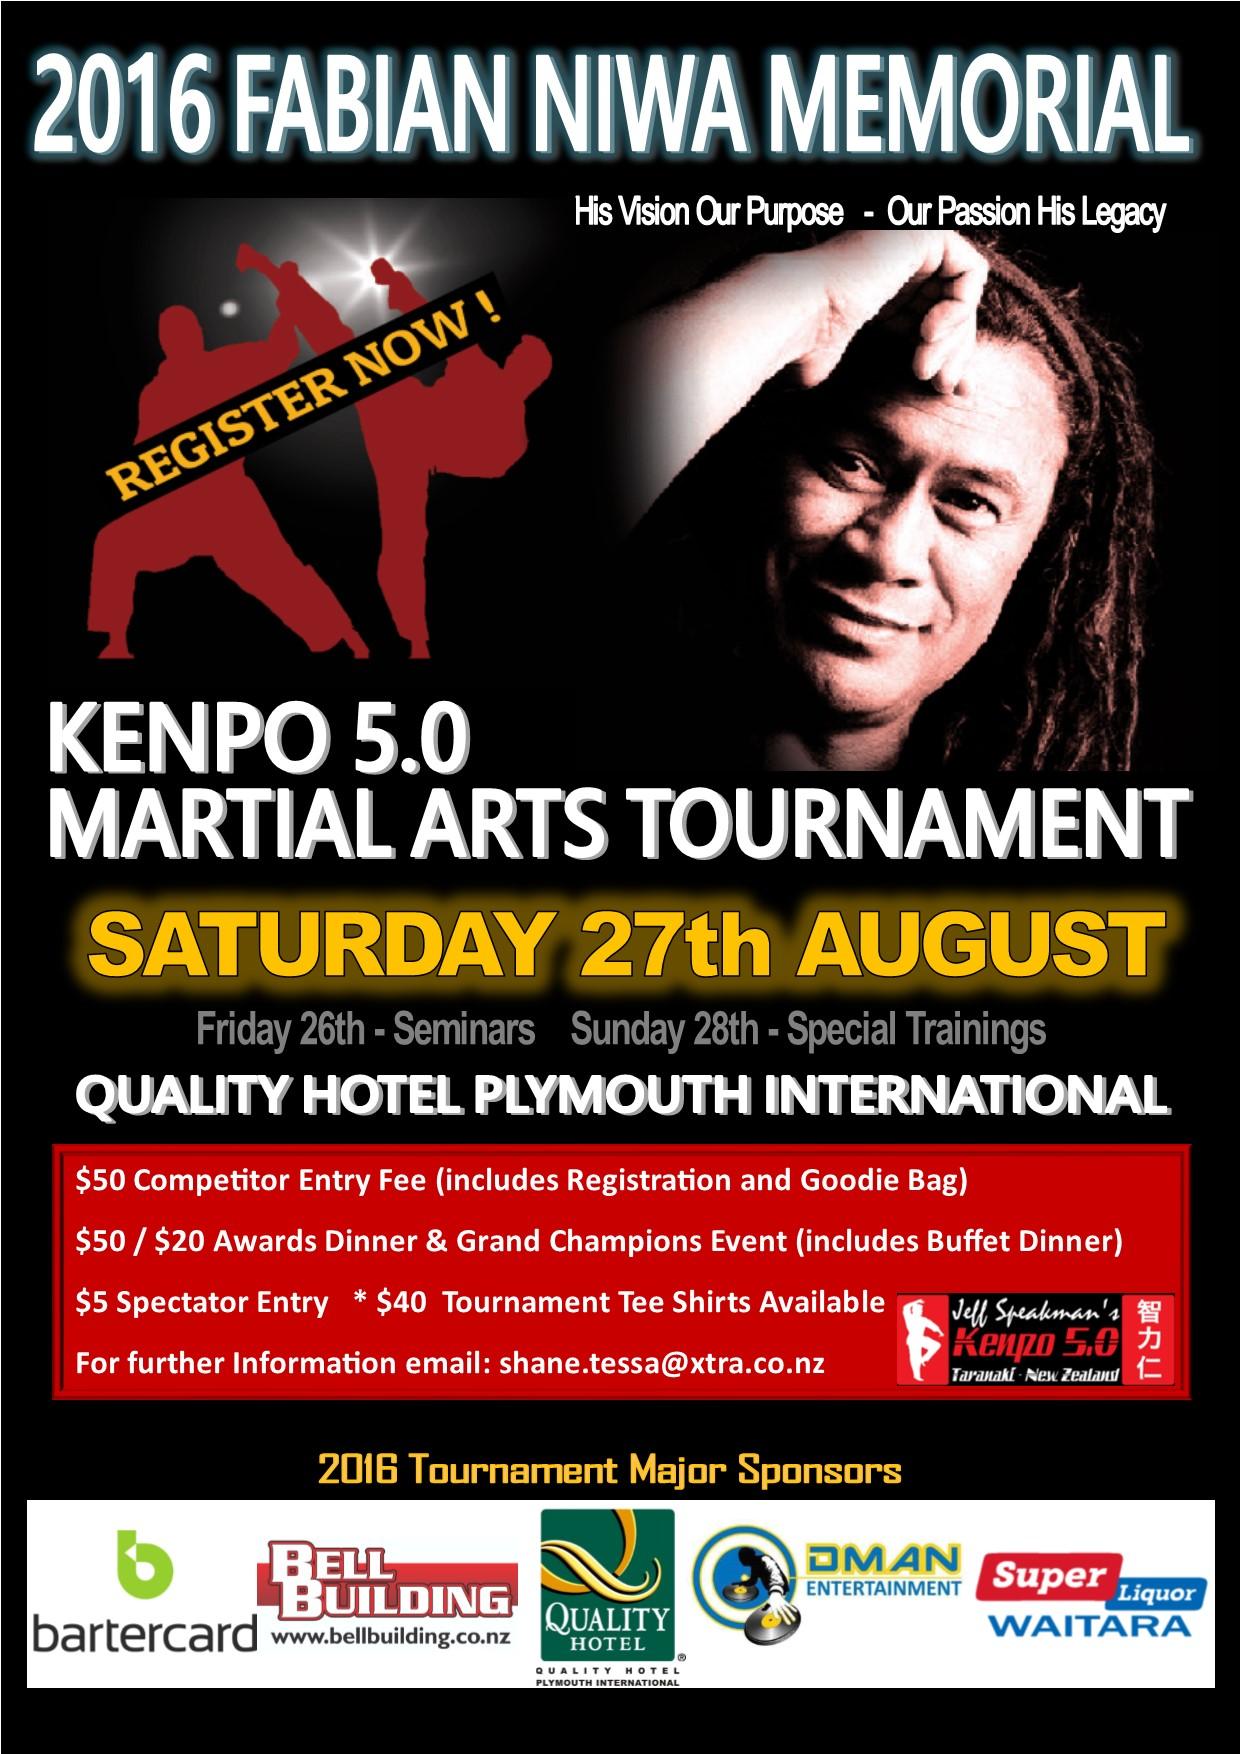 2016 Fabian Niwa Memorial Kenpo International Martial Arts Tournament